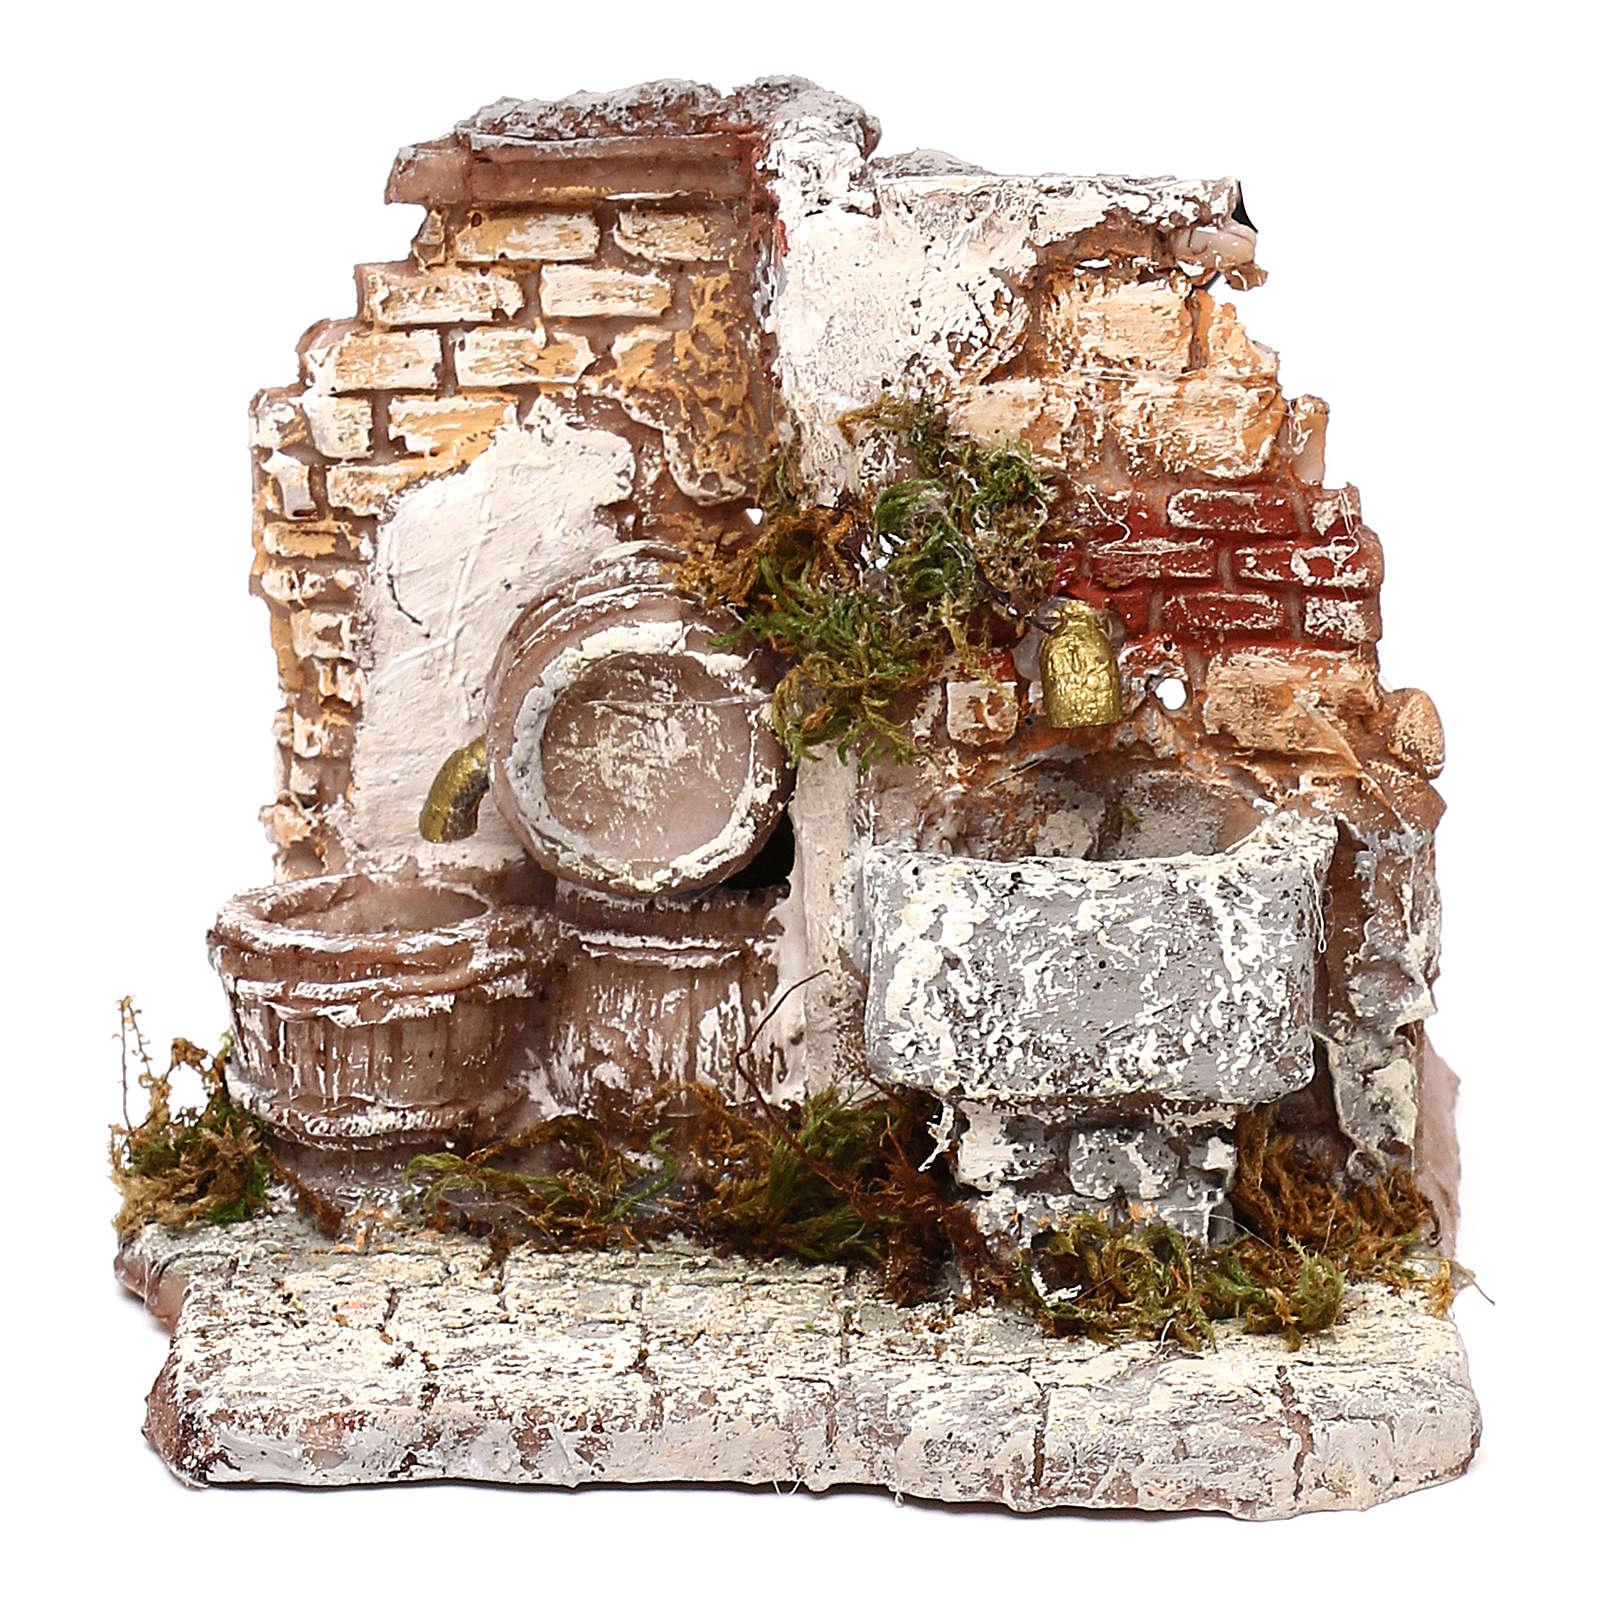 Doble fuente que funciona pared de ladrillos 10x15x15 cm belén Nápoles 6-8 cm 4